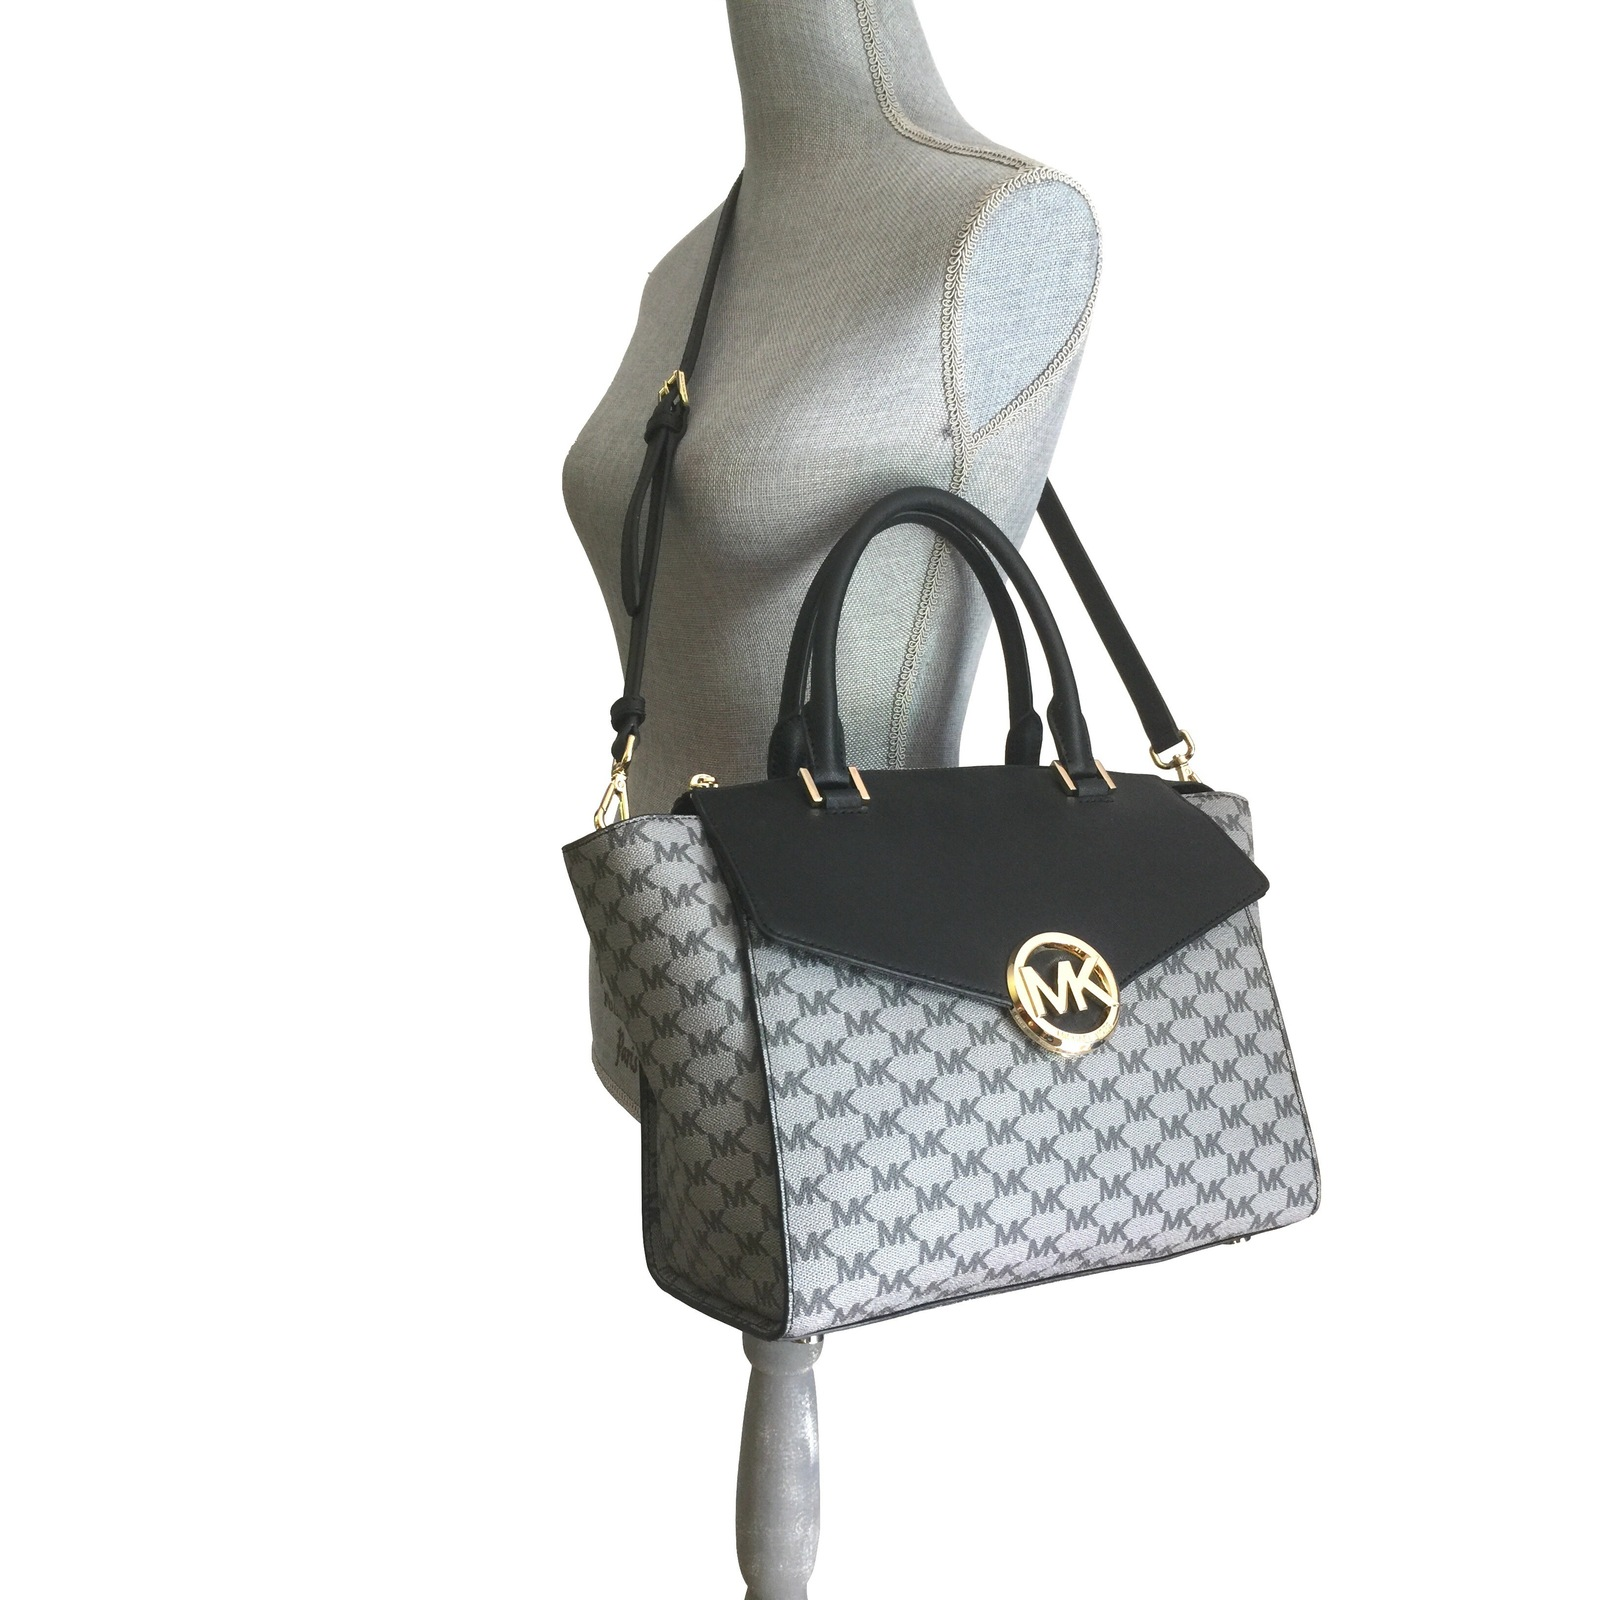 5075a0fb29c5 MICHAEL KORS HUDSON LARGE SATCHEL BLACK GRAY MK LOGO PVC LEATHER BAG PURSE